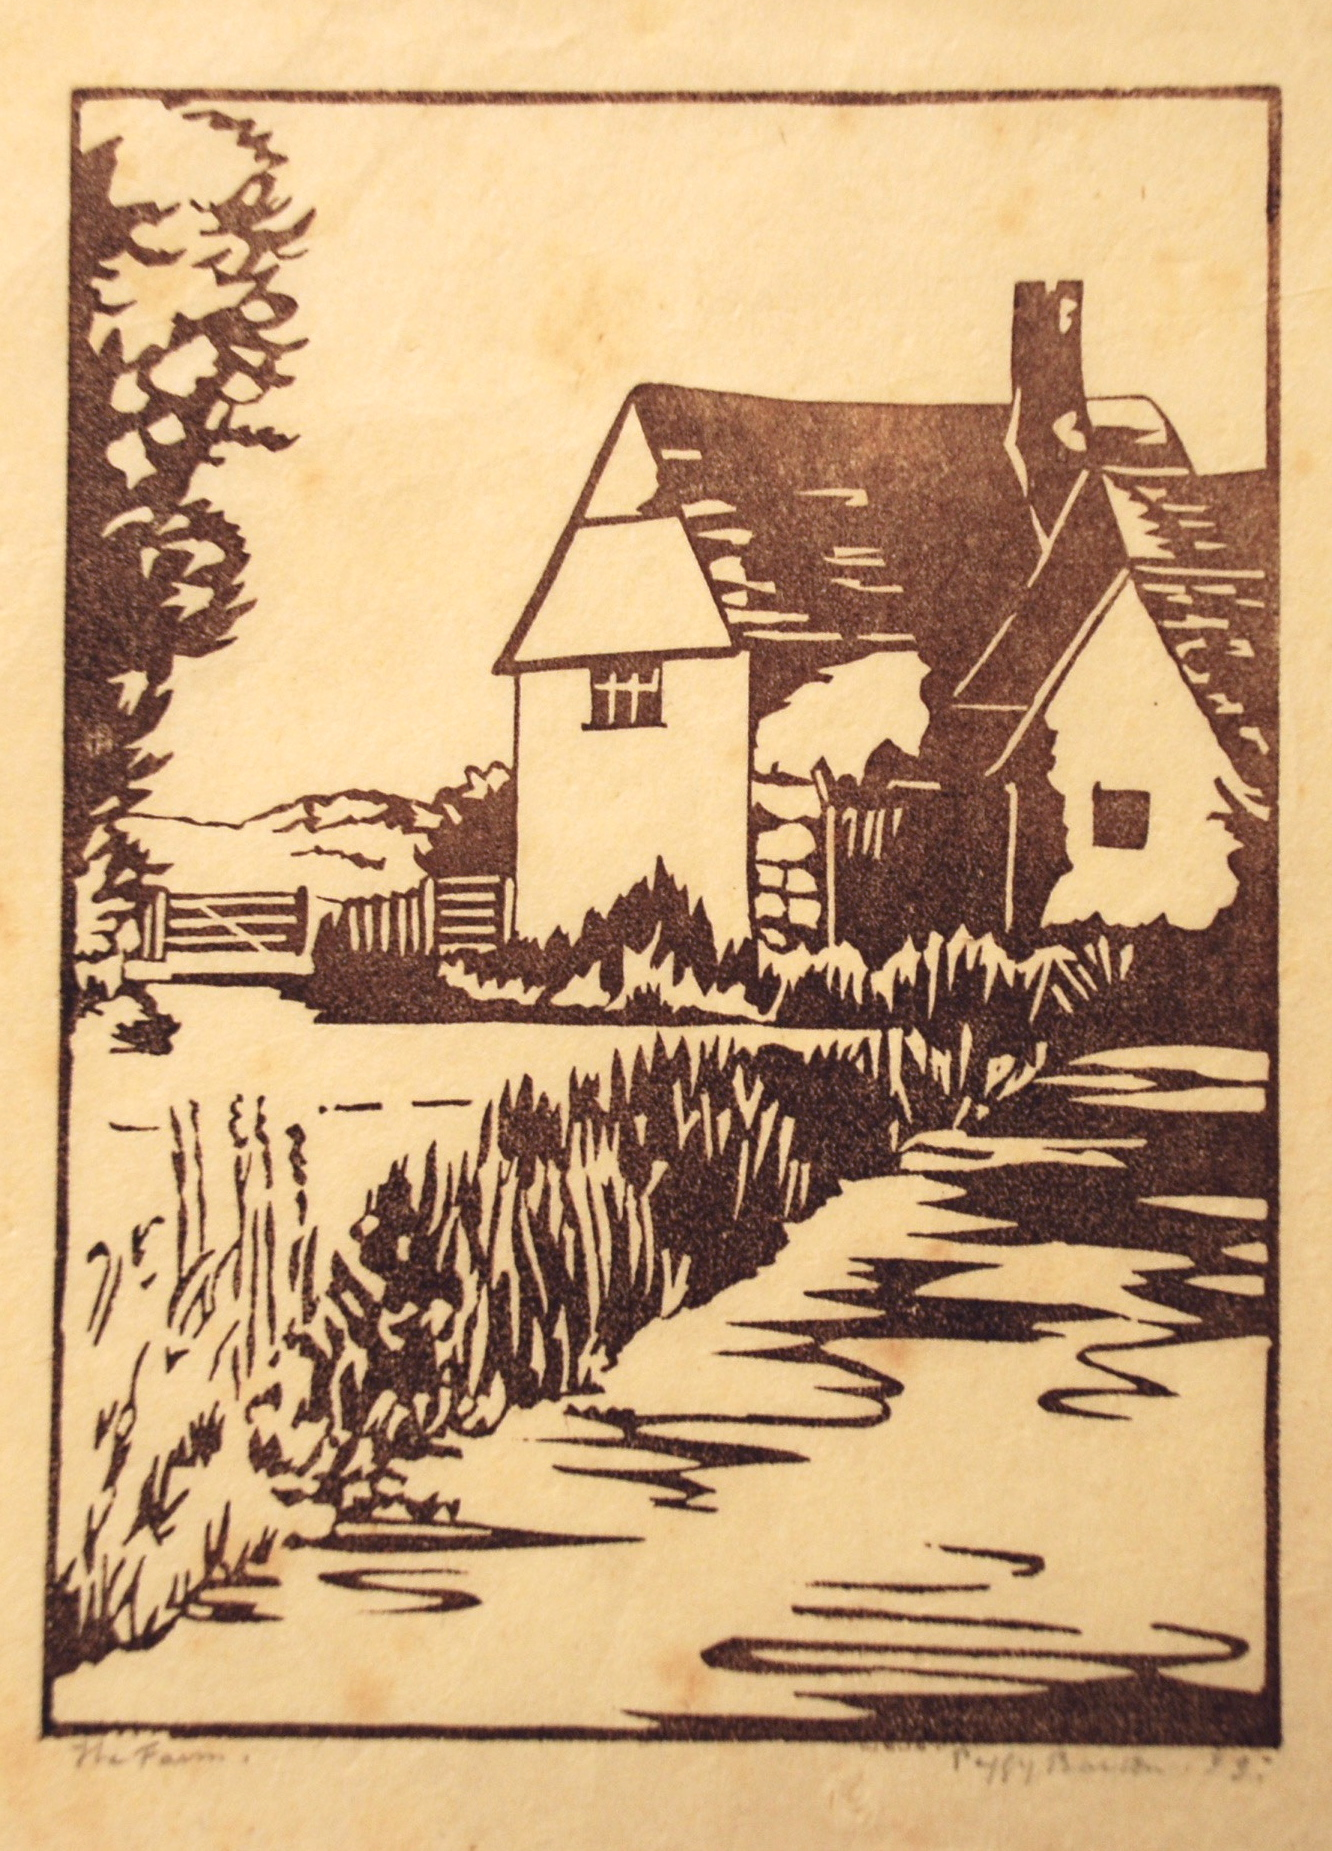 Peggy Barton, The Farm, 1933